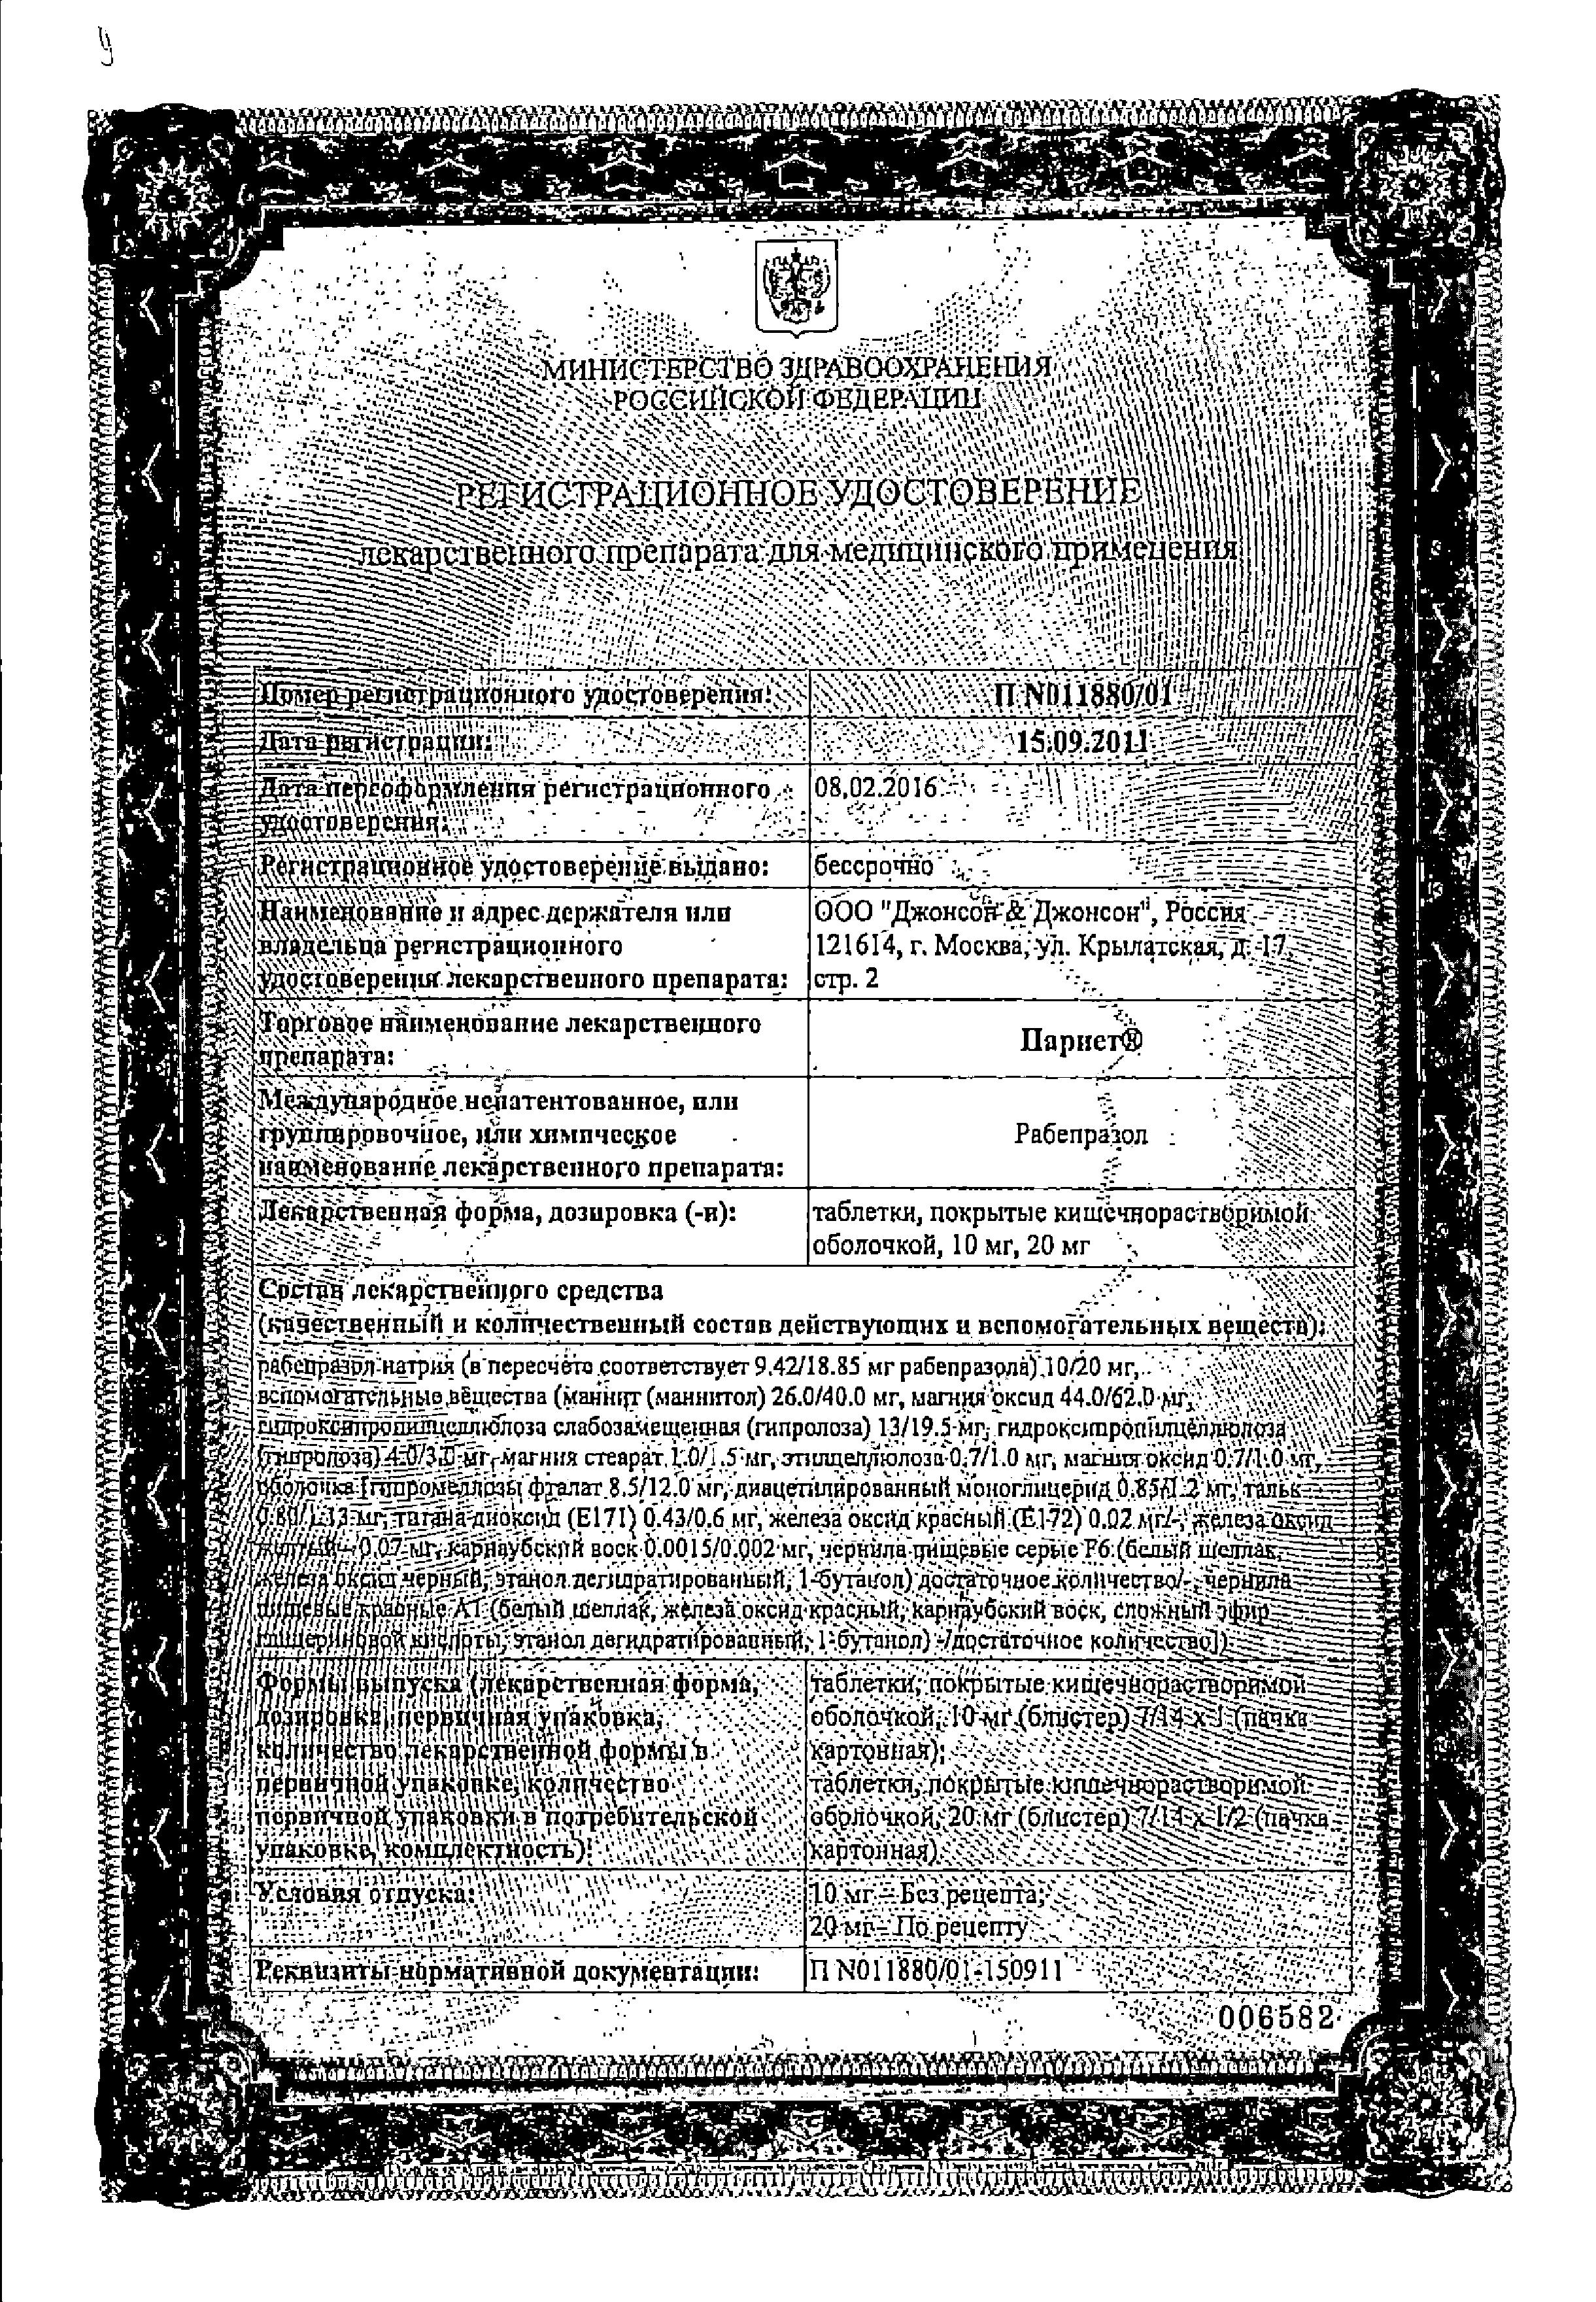 Париет сертификат